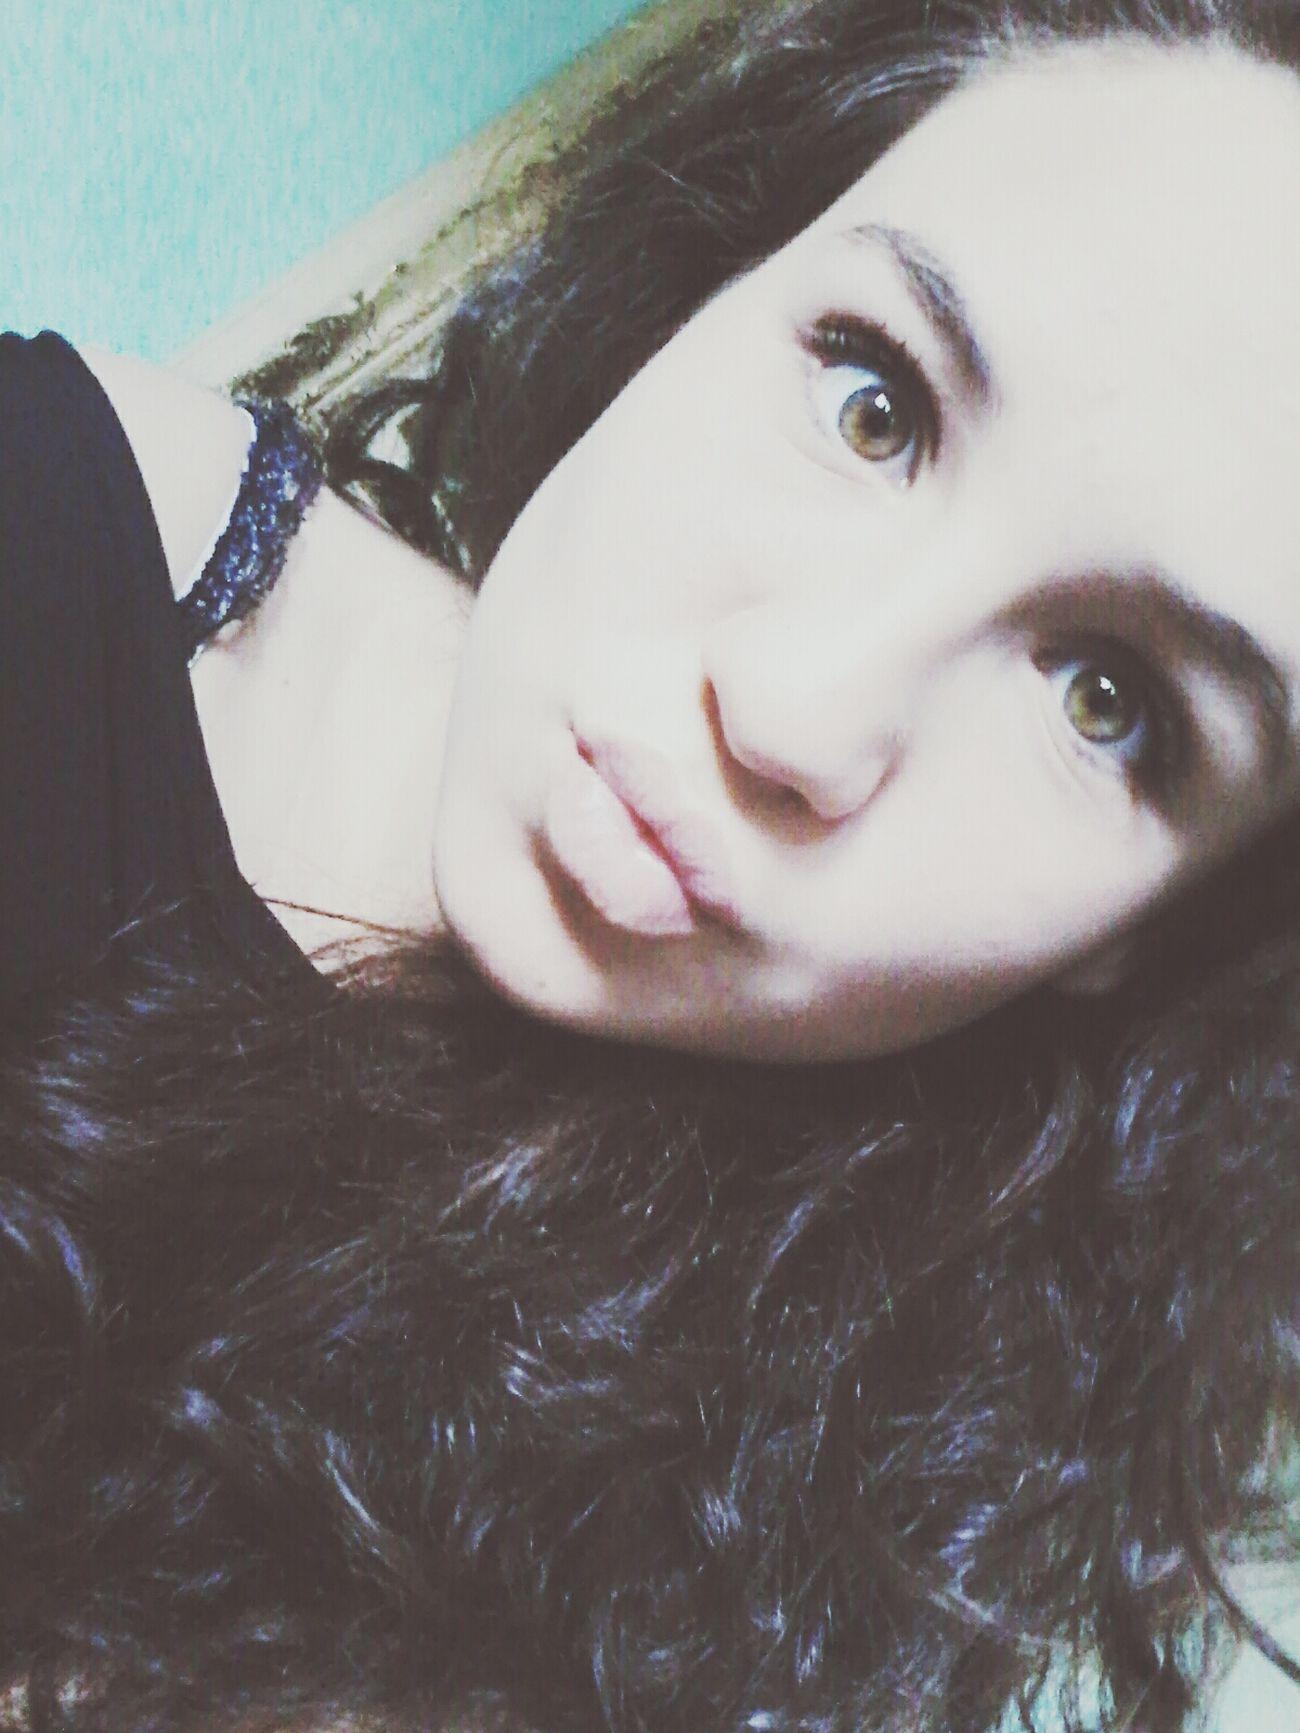 Me Kiss Makebeautiful Occhiverdi ☆★